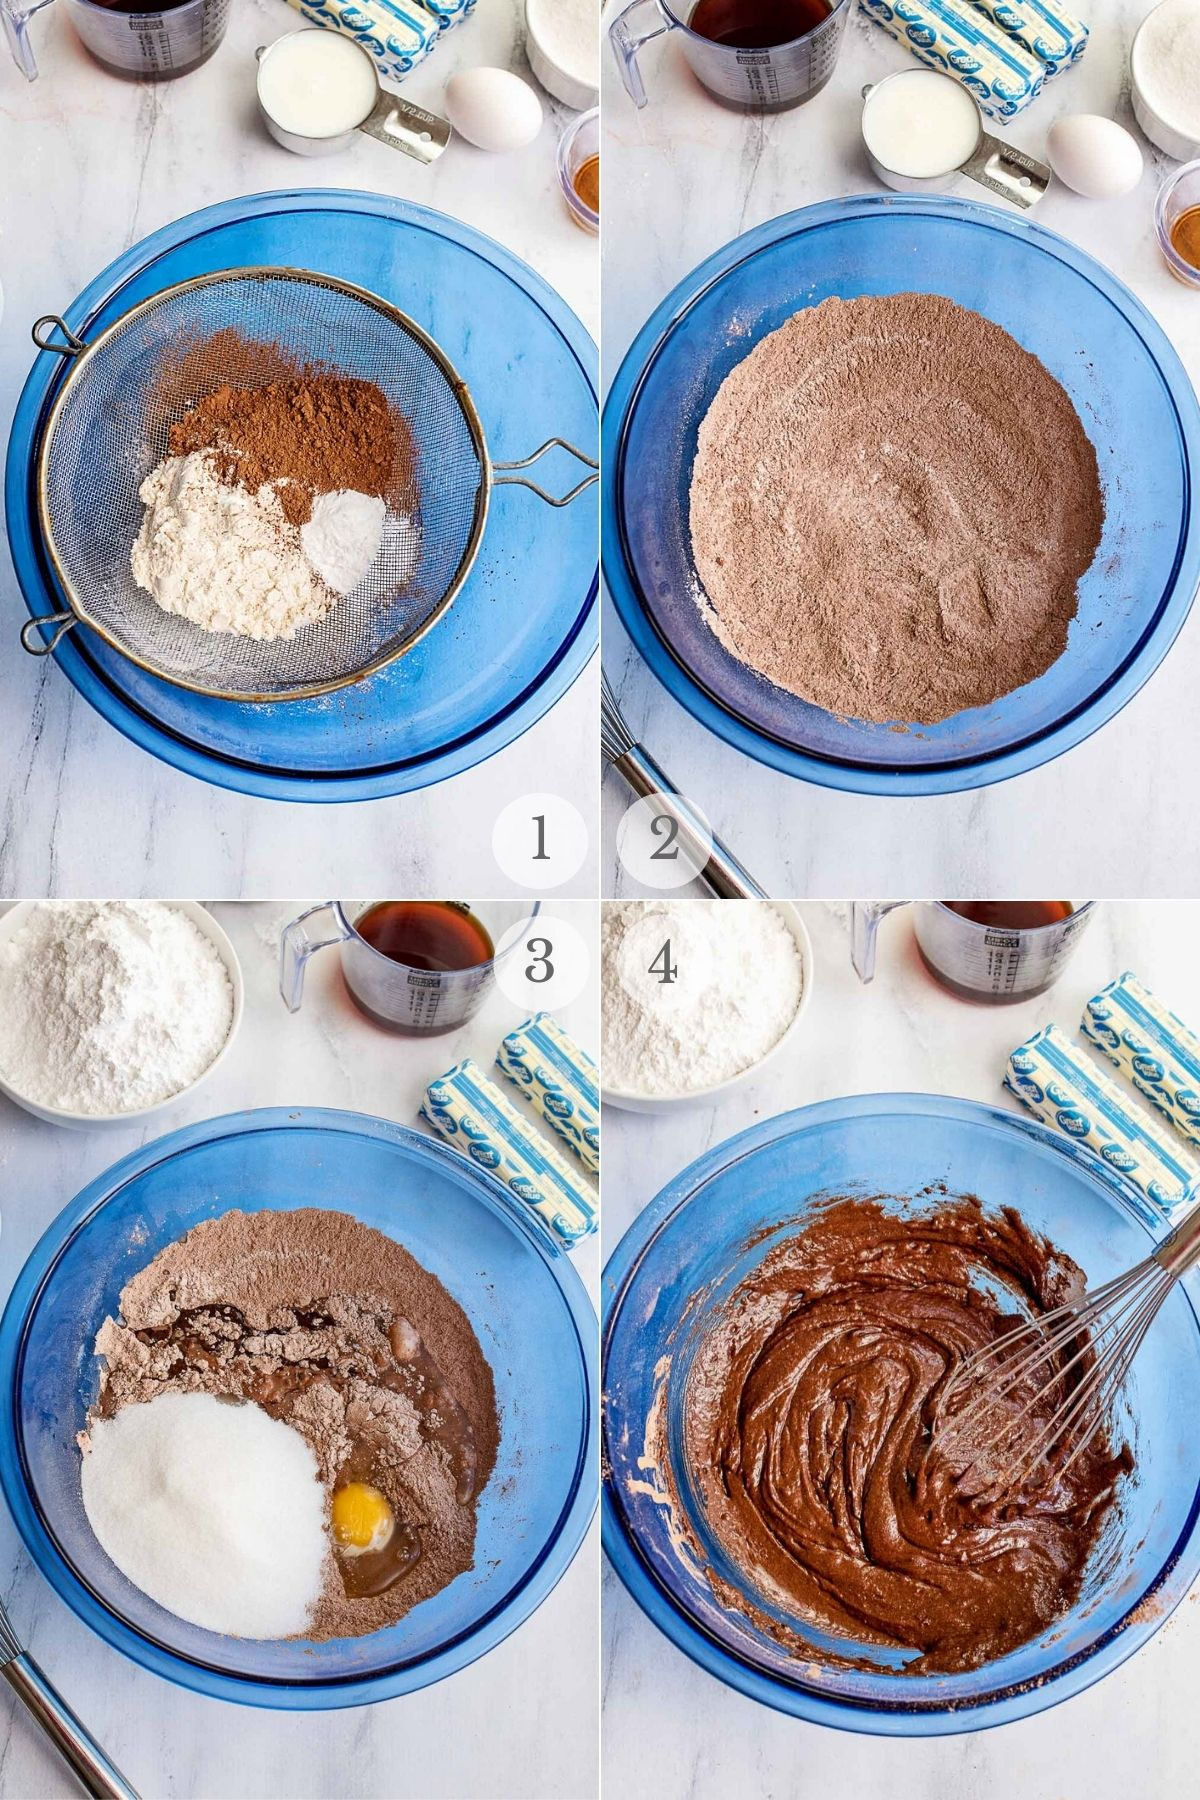 chocolate peanut butter cupcakes recipe steps 1-4